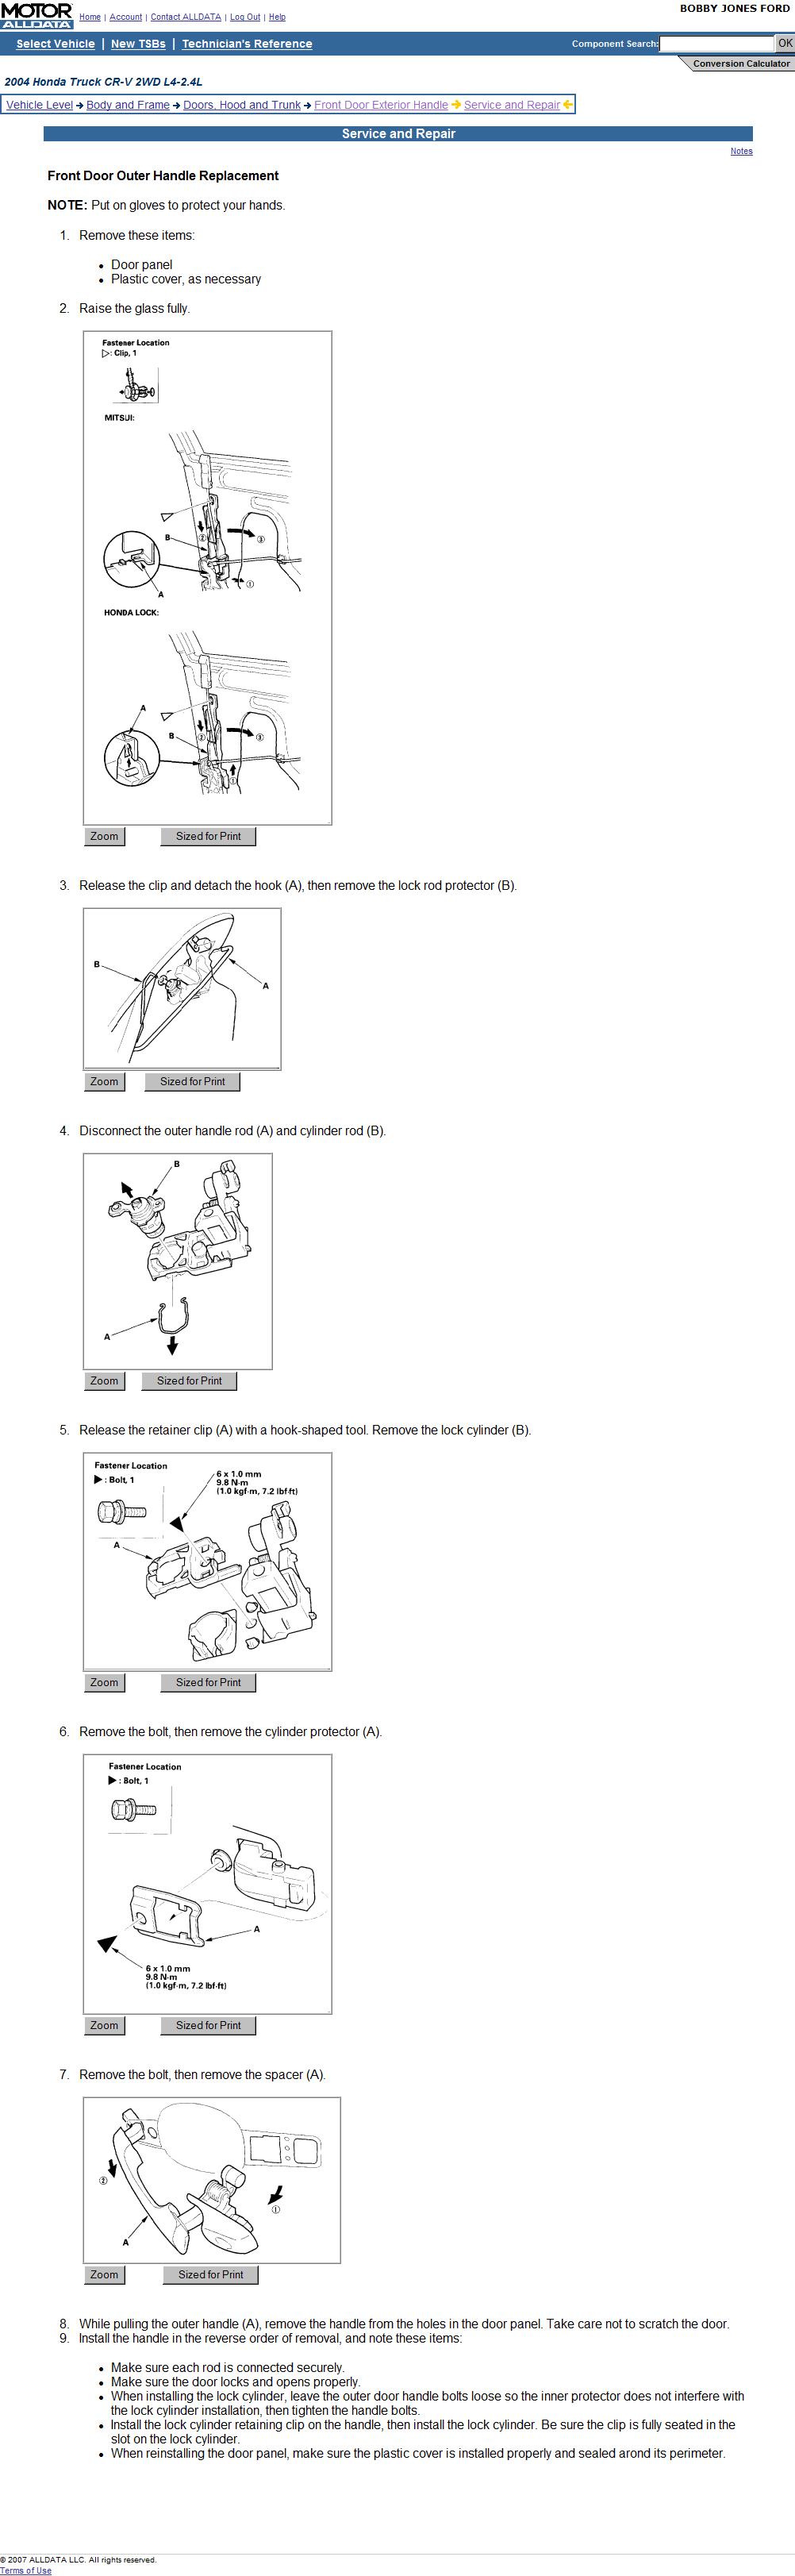 How do i remove the exterior door handle on a 2004 honda crv - How to remove exterior door knob ...